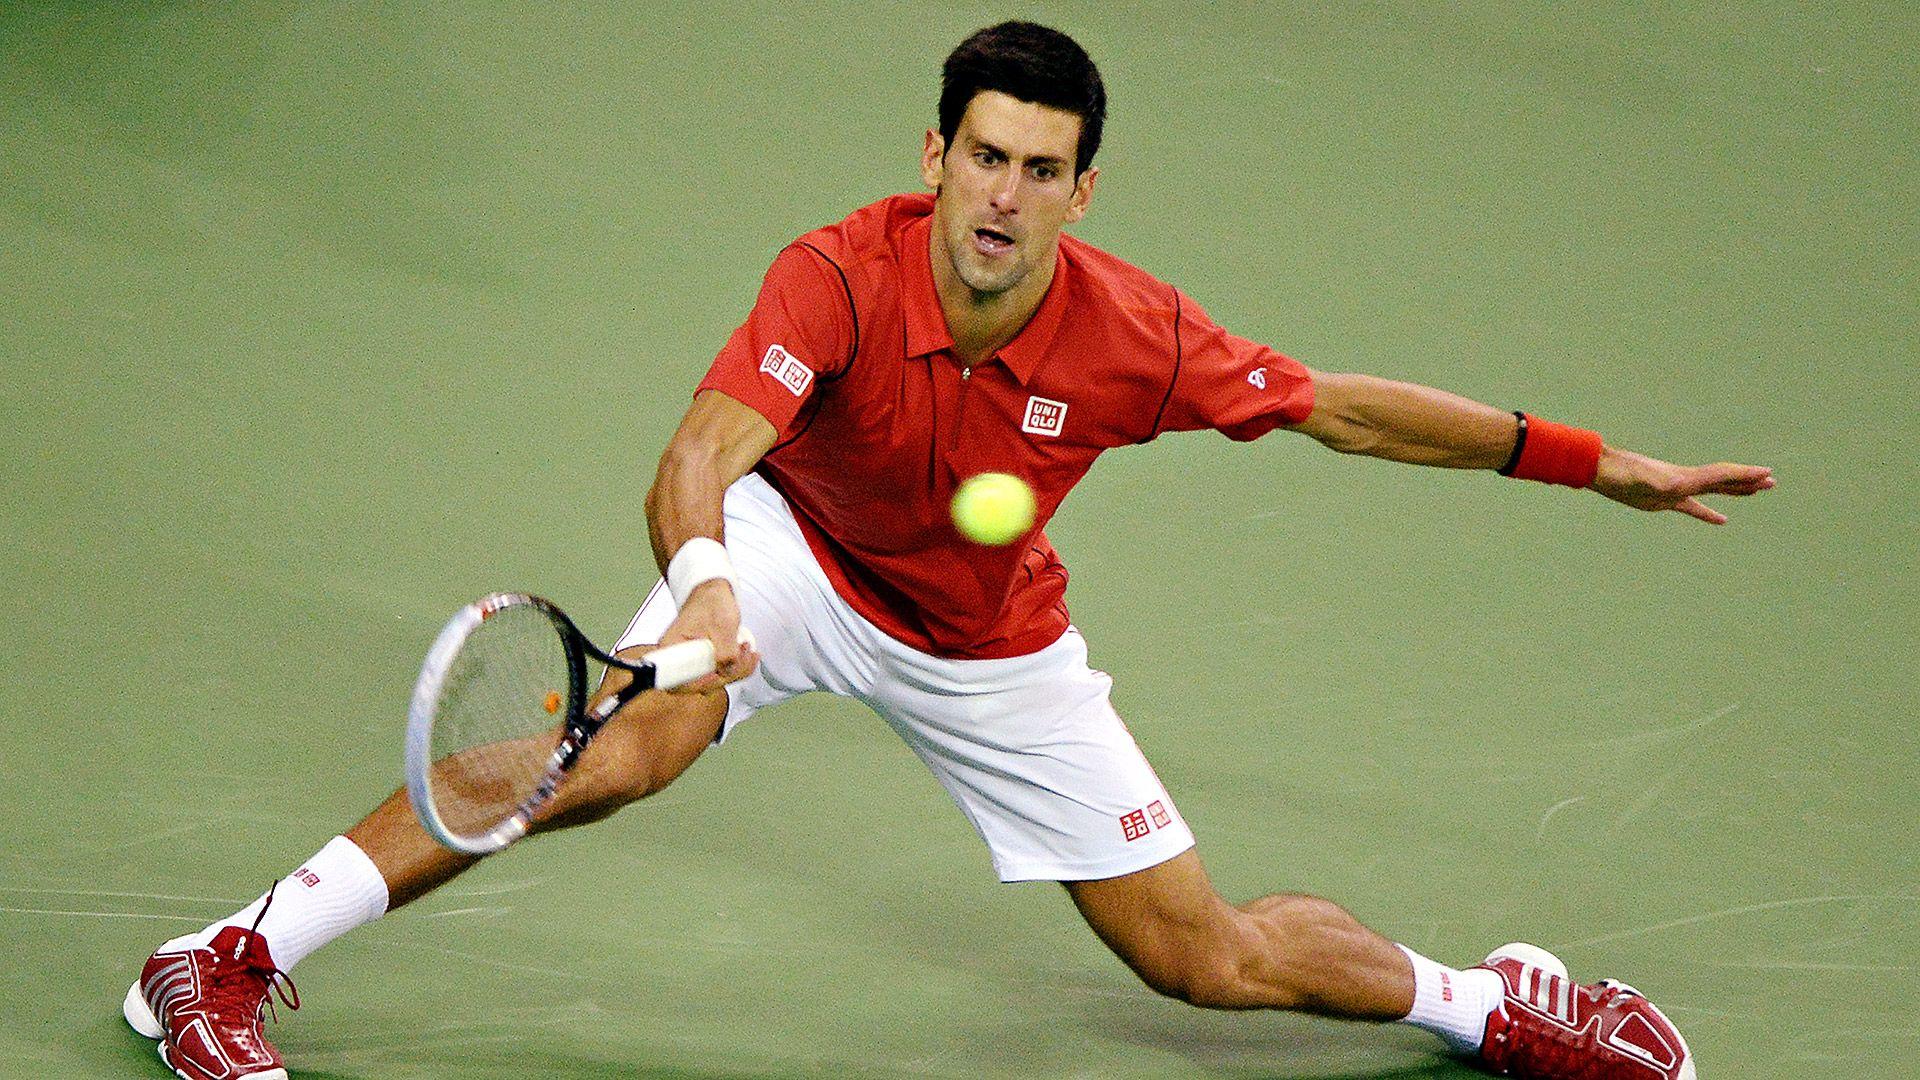 Novak Djokovic takes Shanghai title